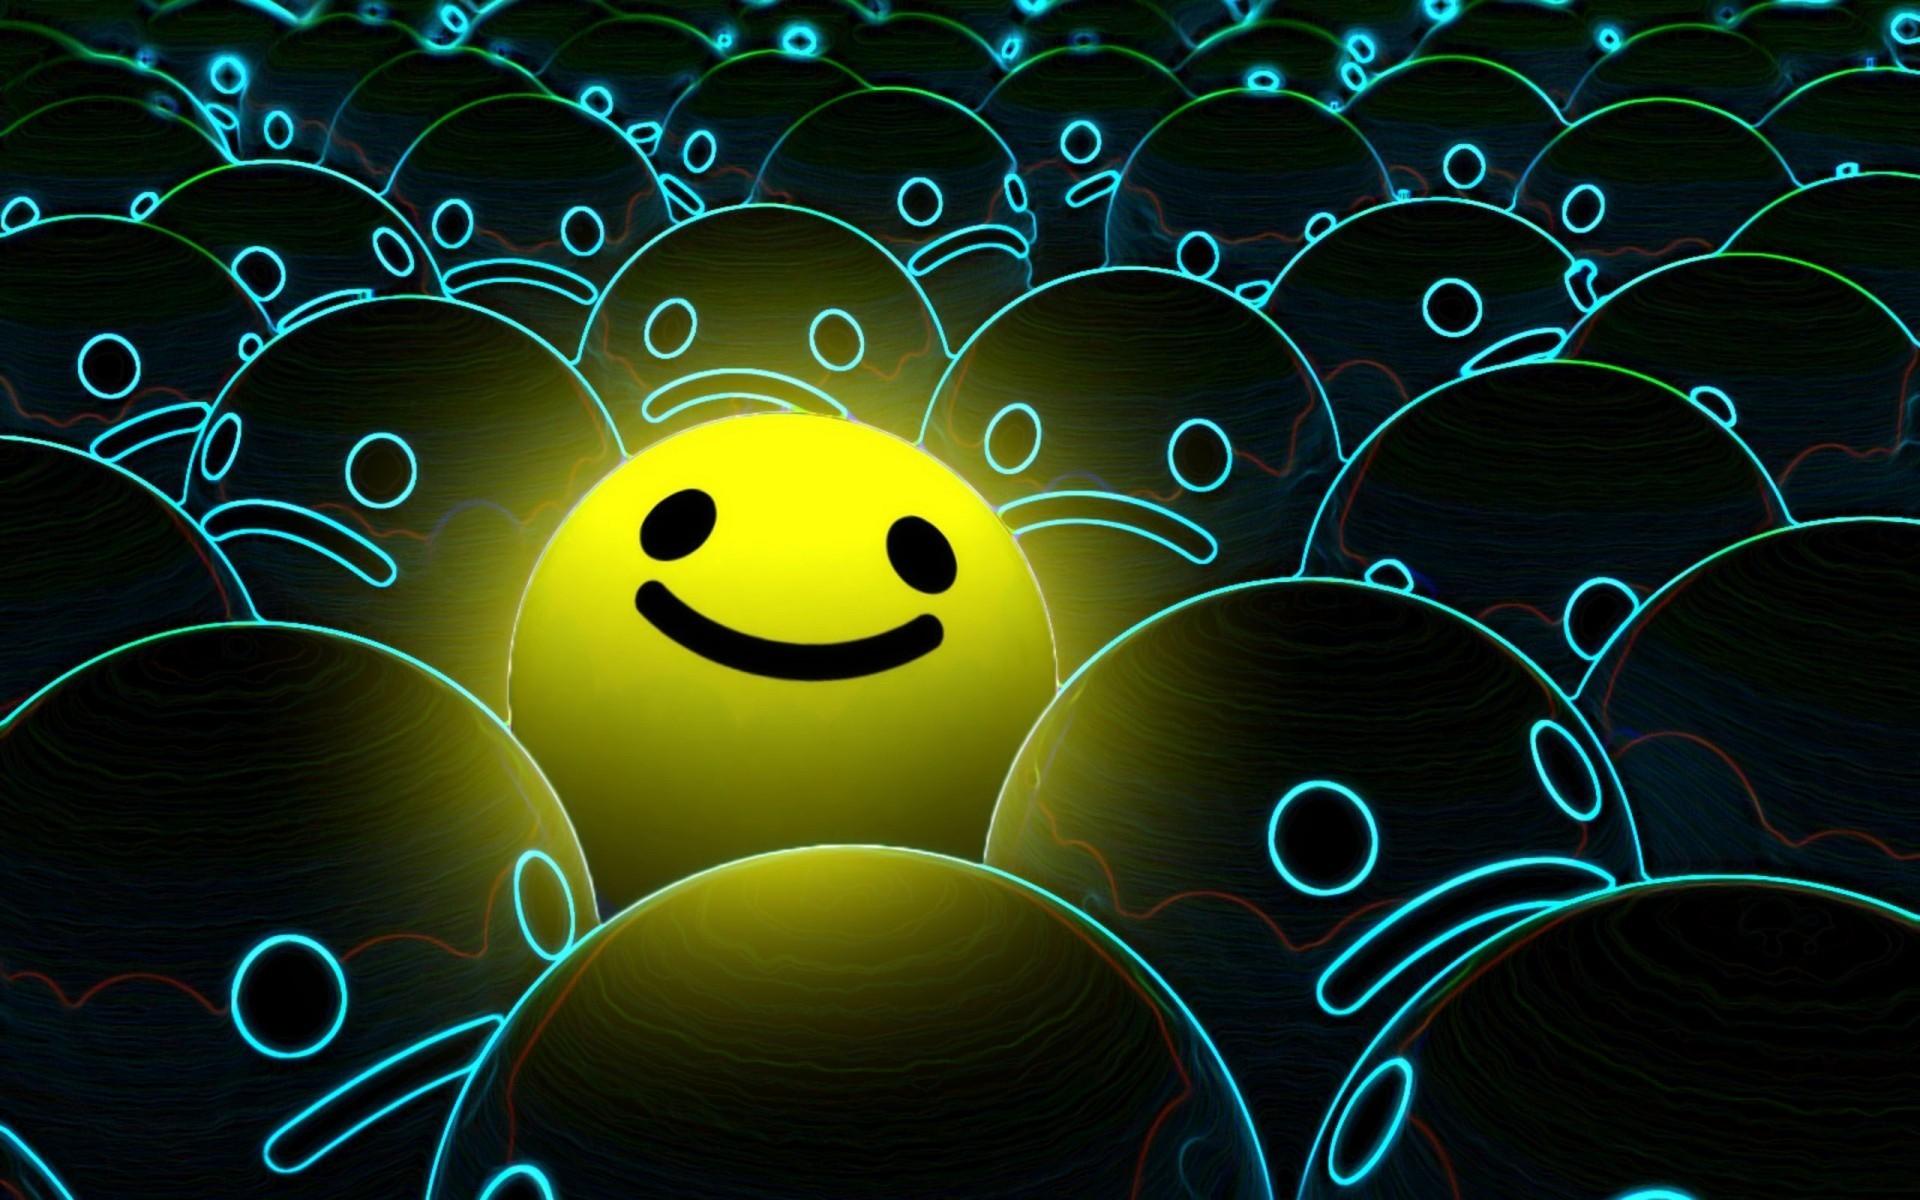 smiley face desktop wallpaper 49025 50675 hd wallpapersjpg 1920x1200